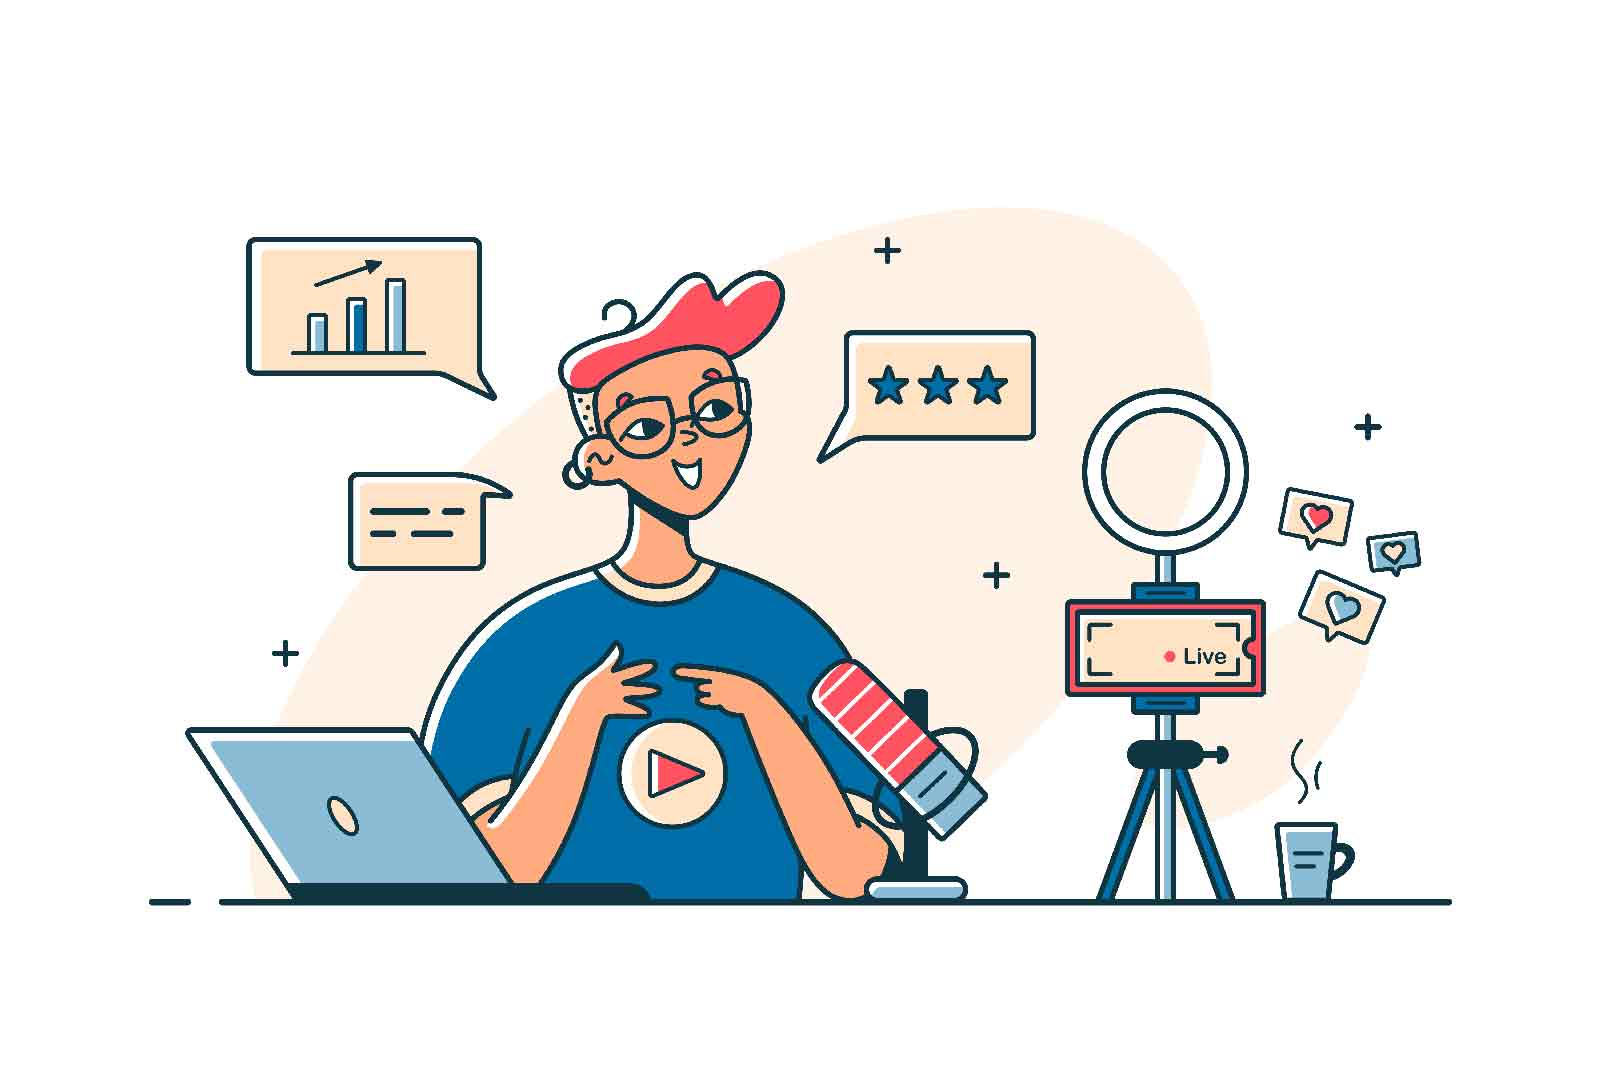 Guy recording vlog video on camera vector illustration. Man talk live on digital device flat style. Vlogger, blogger, social media concept